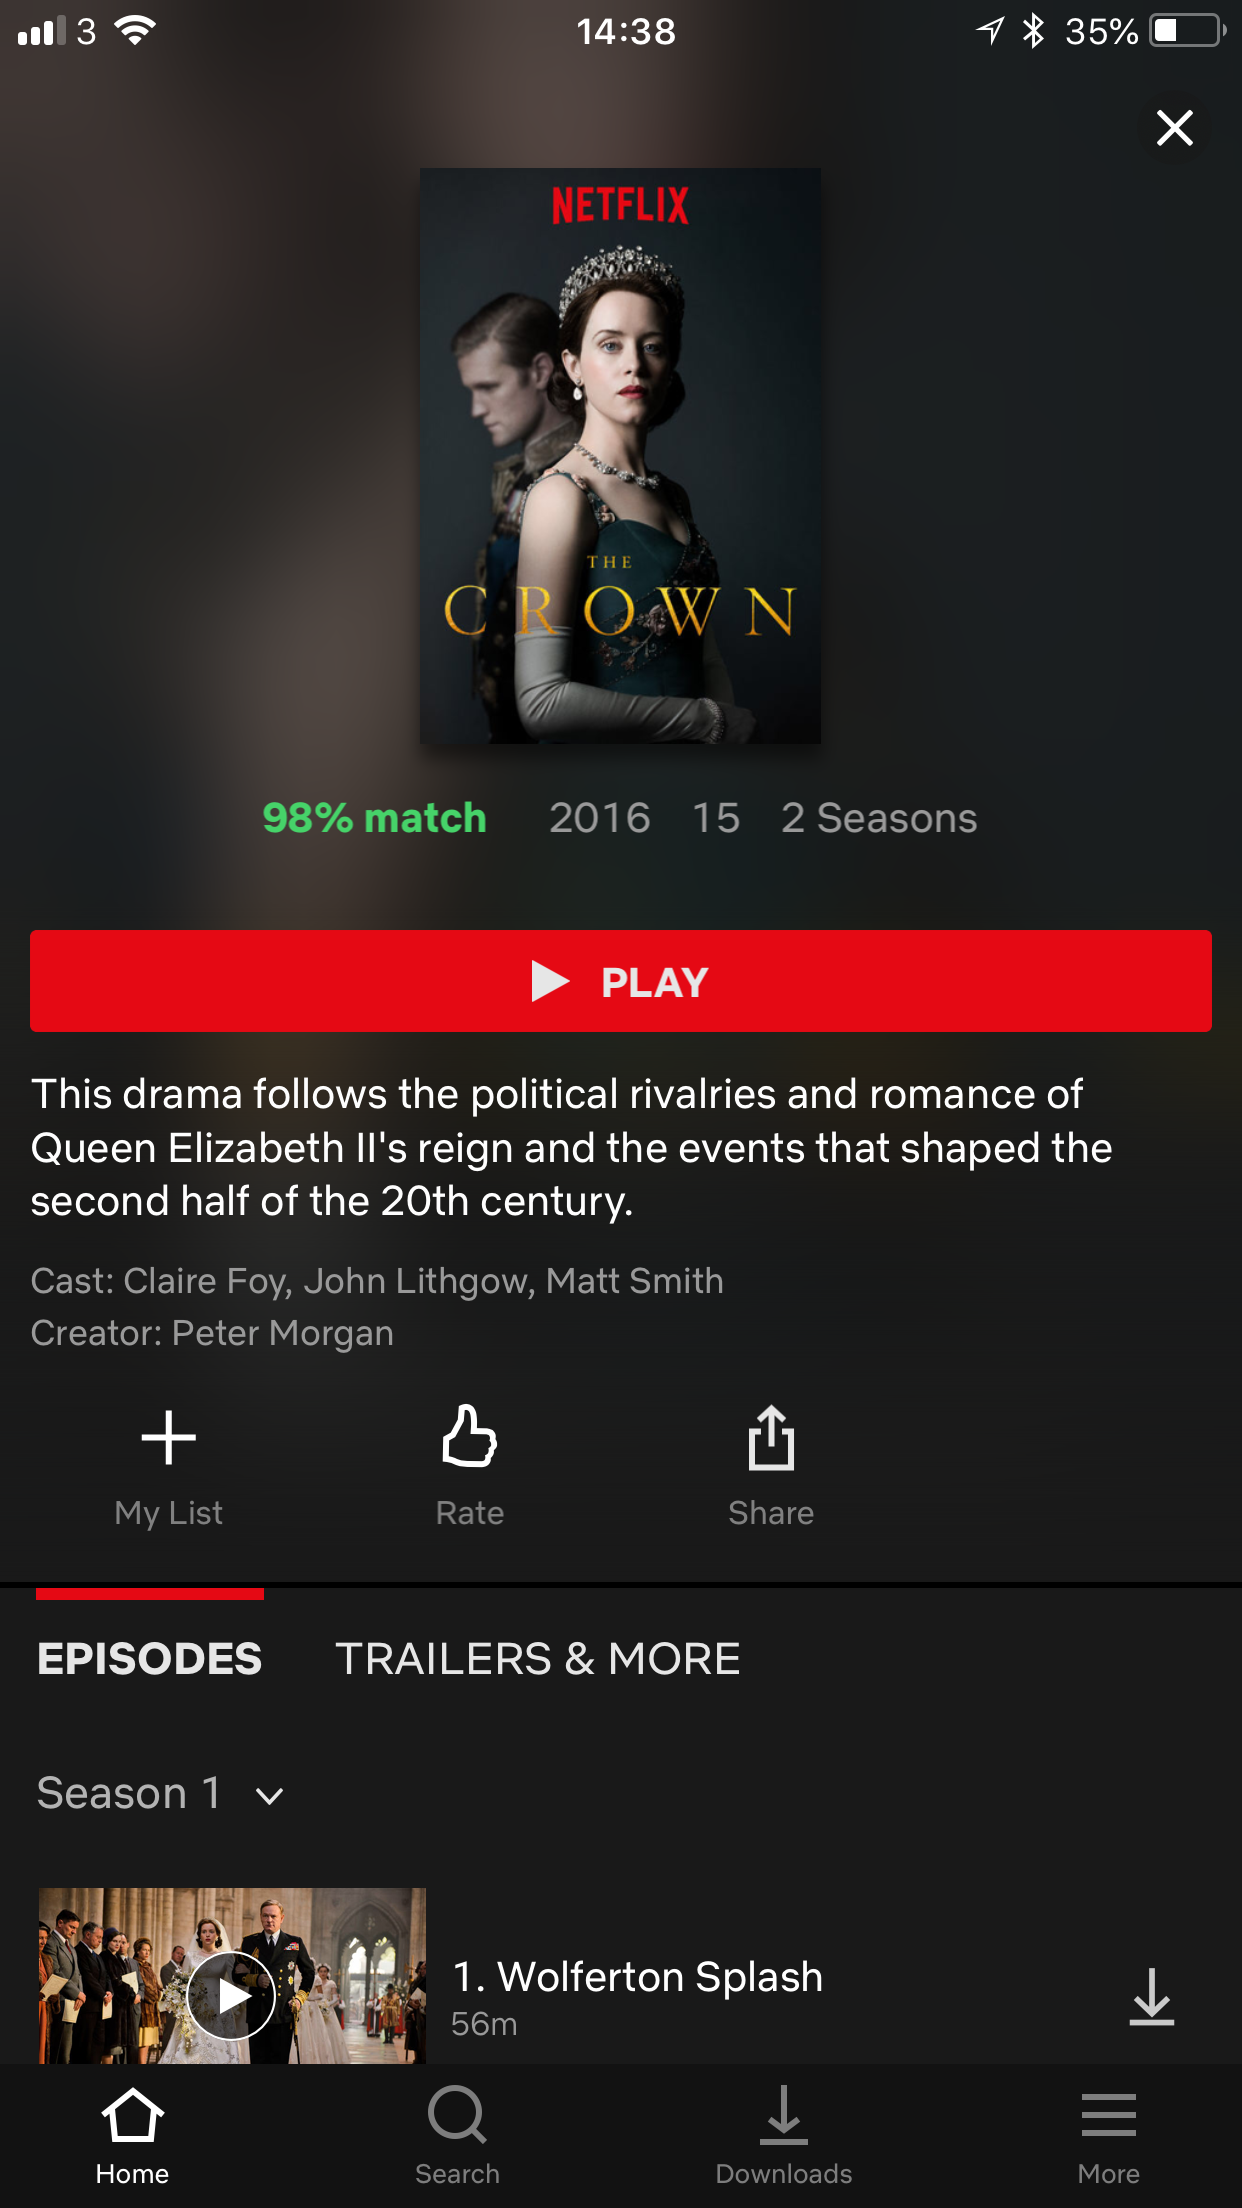 Netflix programme selection screen The Crown